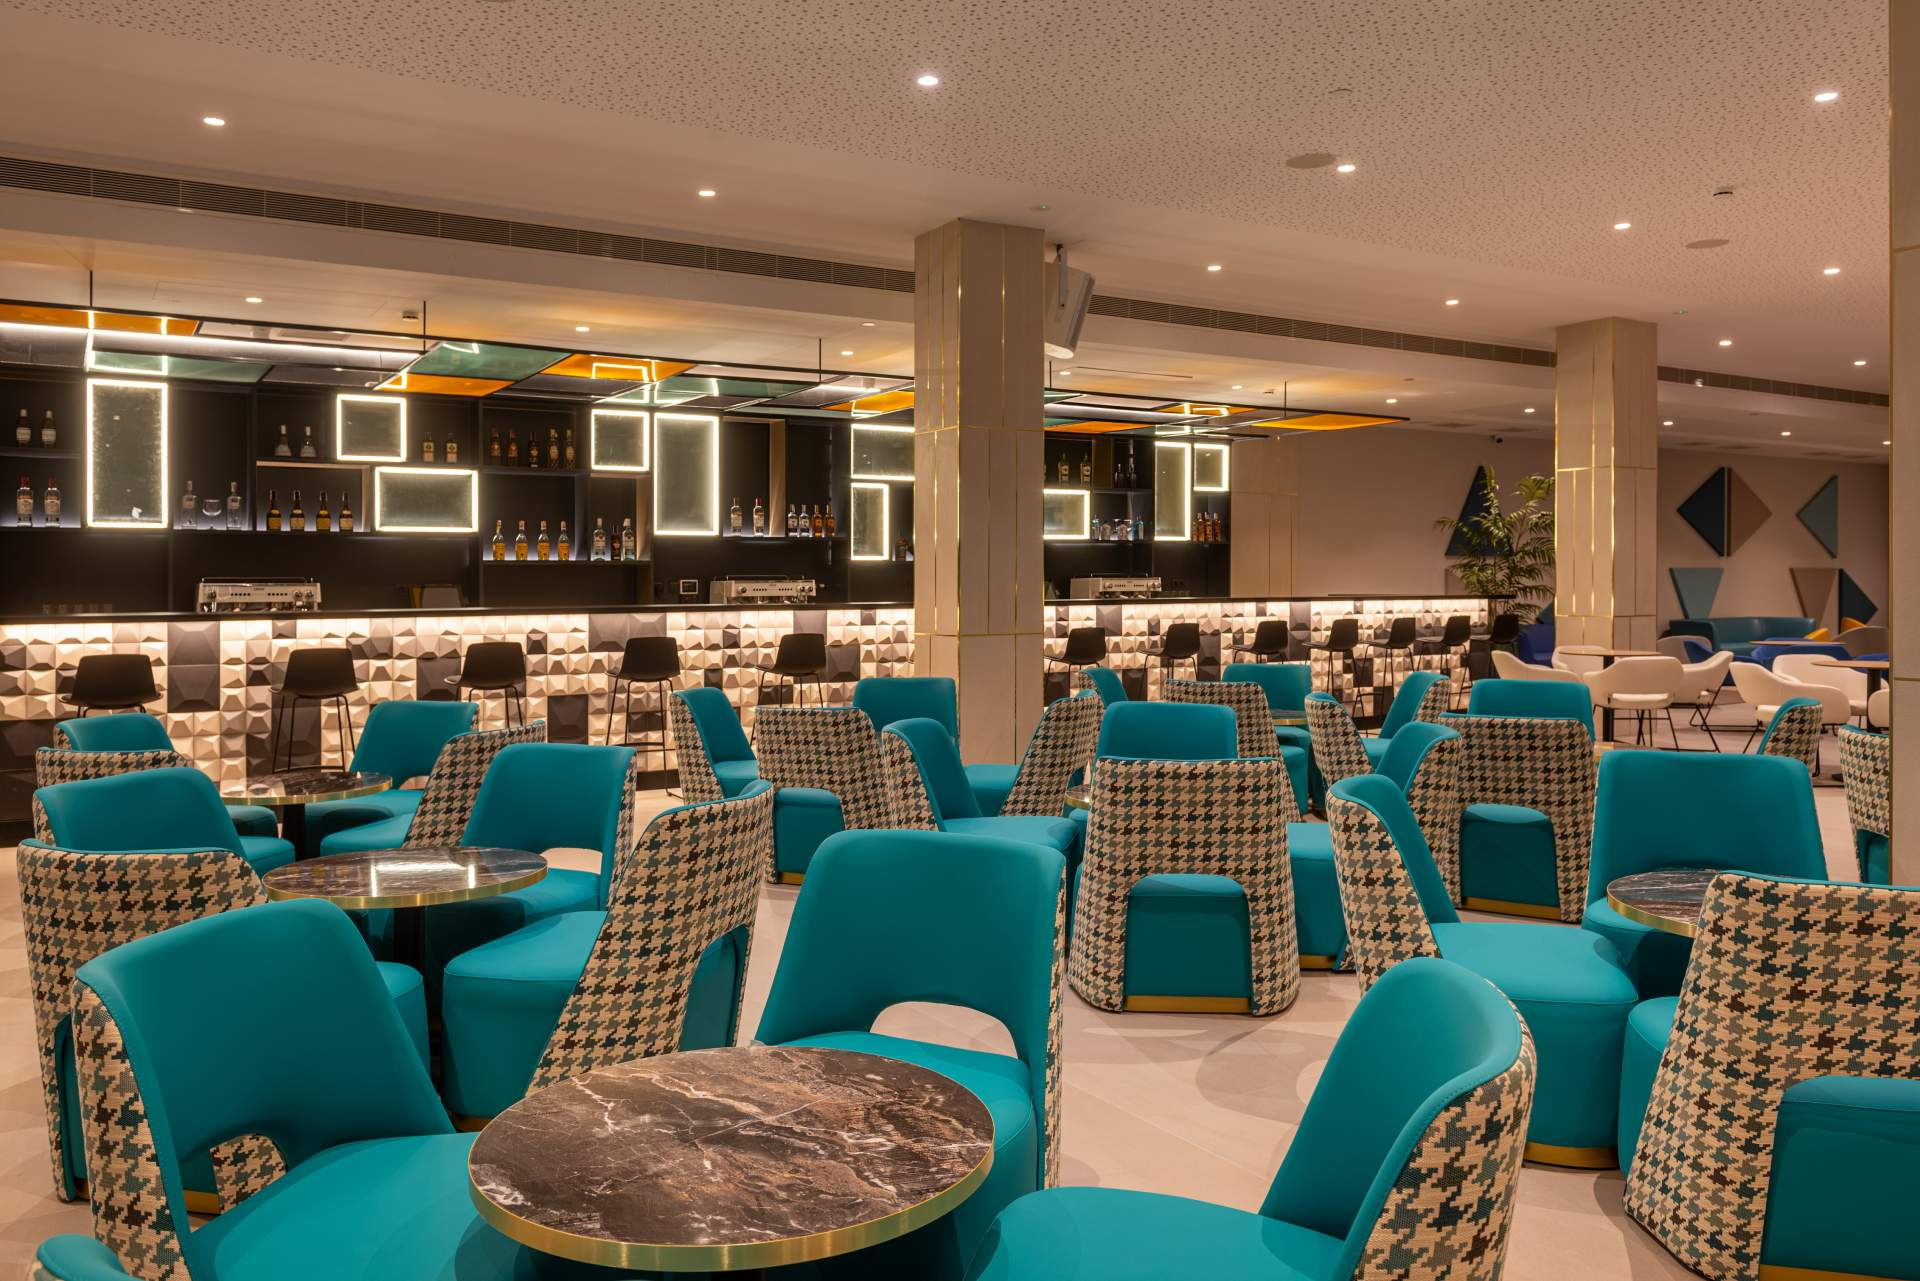 Busreis pendel Lloret de Mar L'AZURE Hotel